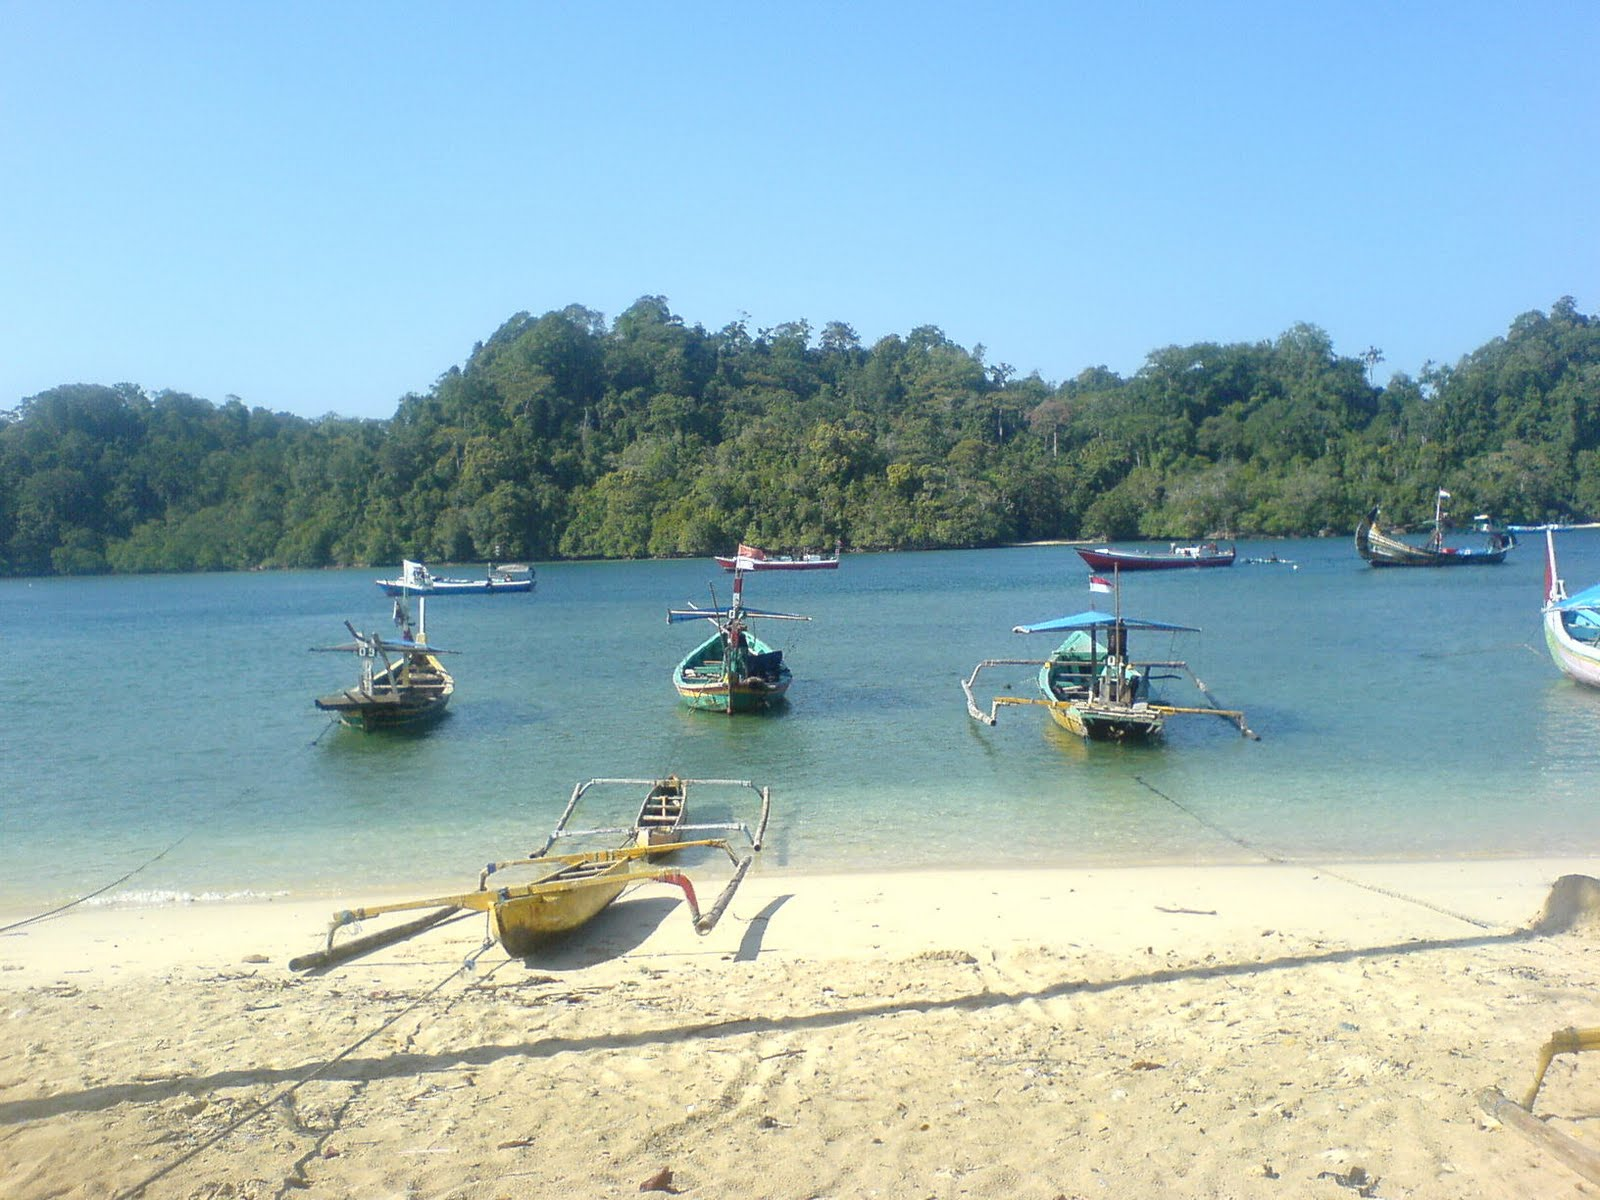 Pantai Sendang Biru Dan Gua Cina Di Malang Jdlines Com